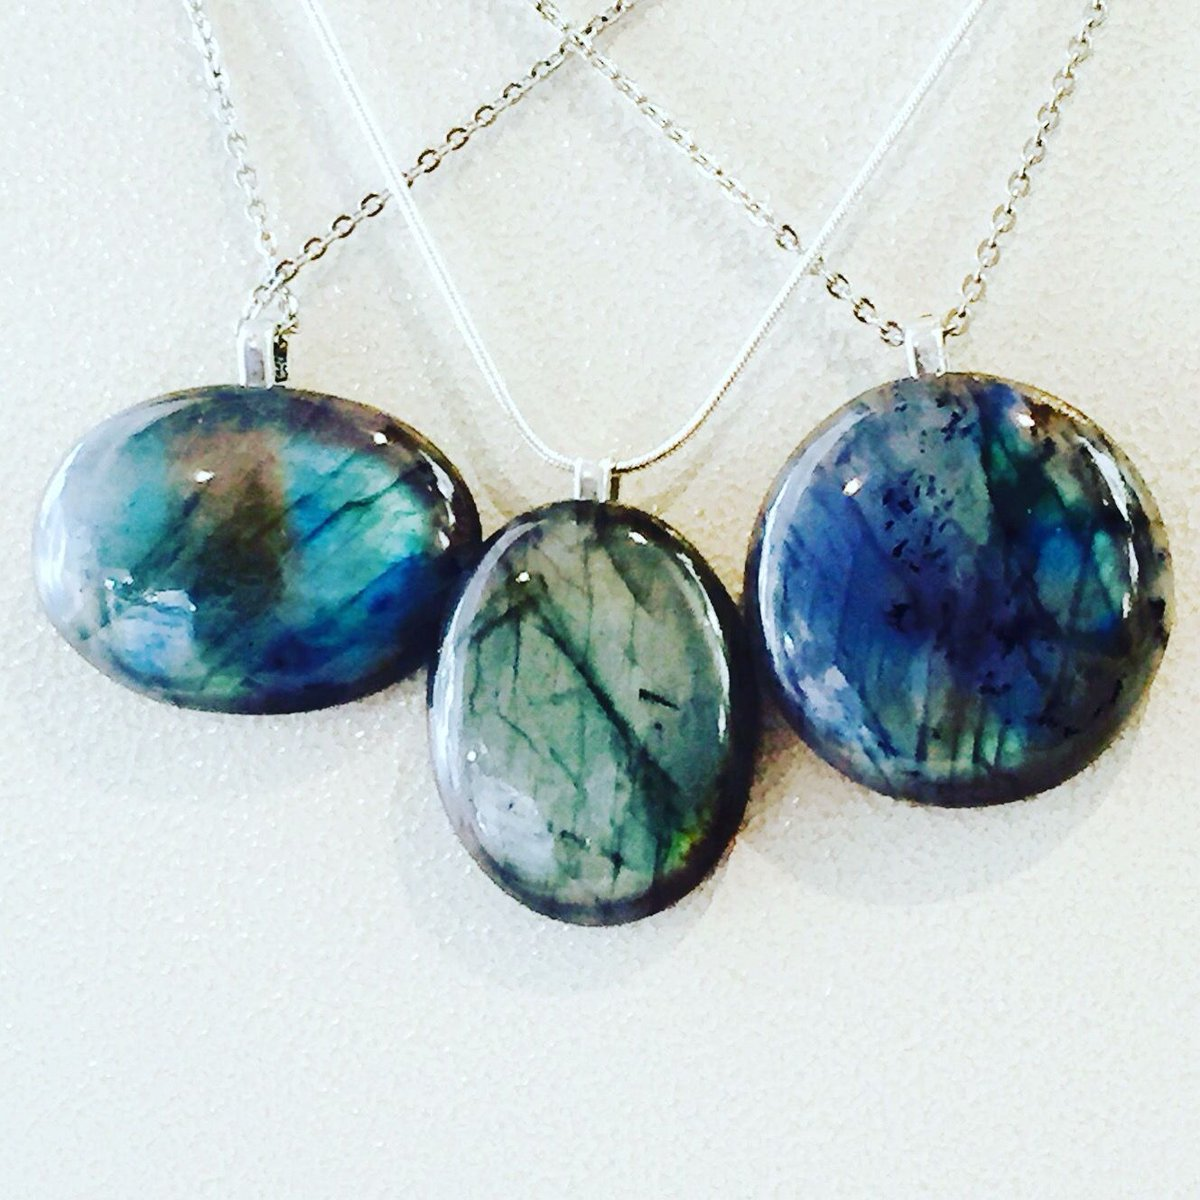 #Labradorite #Necklace 3 Styles #Handmade #Jewelry  https:// buff.ly/2jQrb3r  &nbsp;   #wearableart #healinggemstones #shop #shopsmall #giftideas #gift<br>http://pic.twitter.com/73NQYZ1aSX